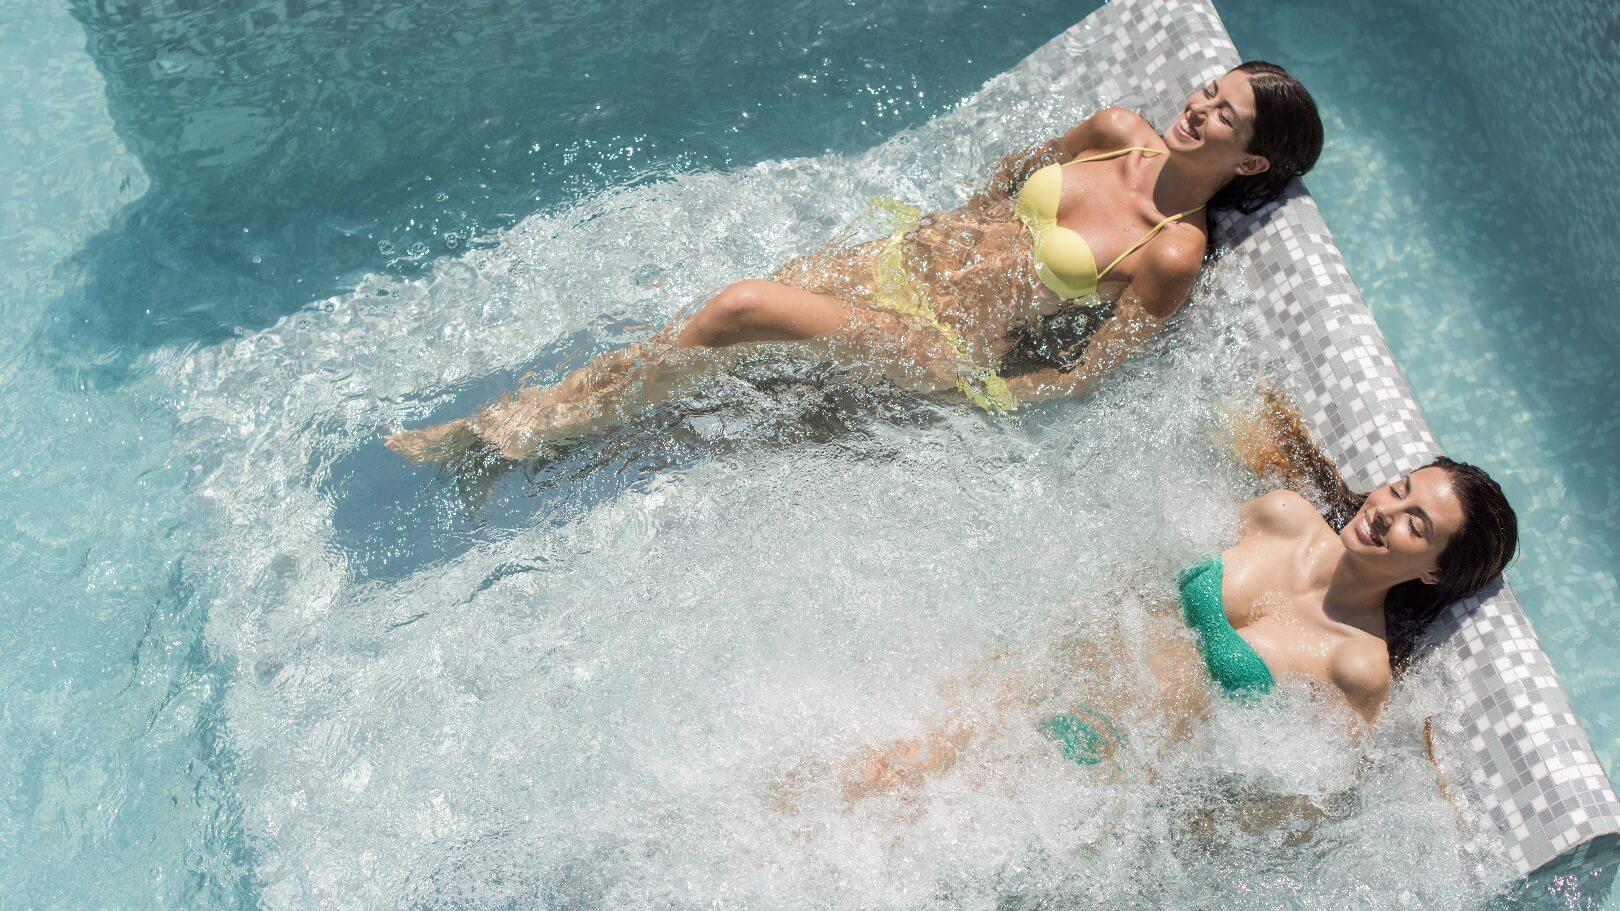 https://www.chialagunaresort.com/wp-content/uploads/2021/04/IHC_Chia-Laguna-Resort_grid_CL4U_spa-pool.jpg